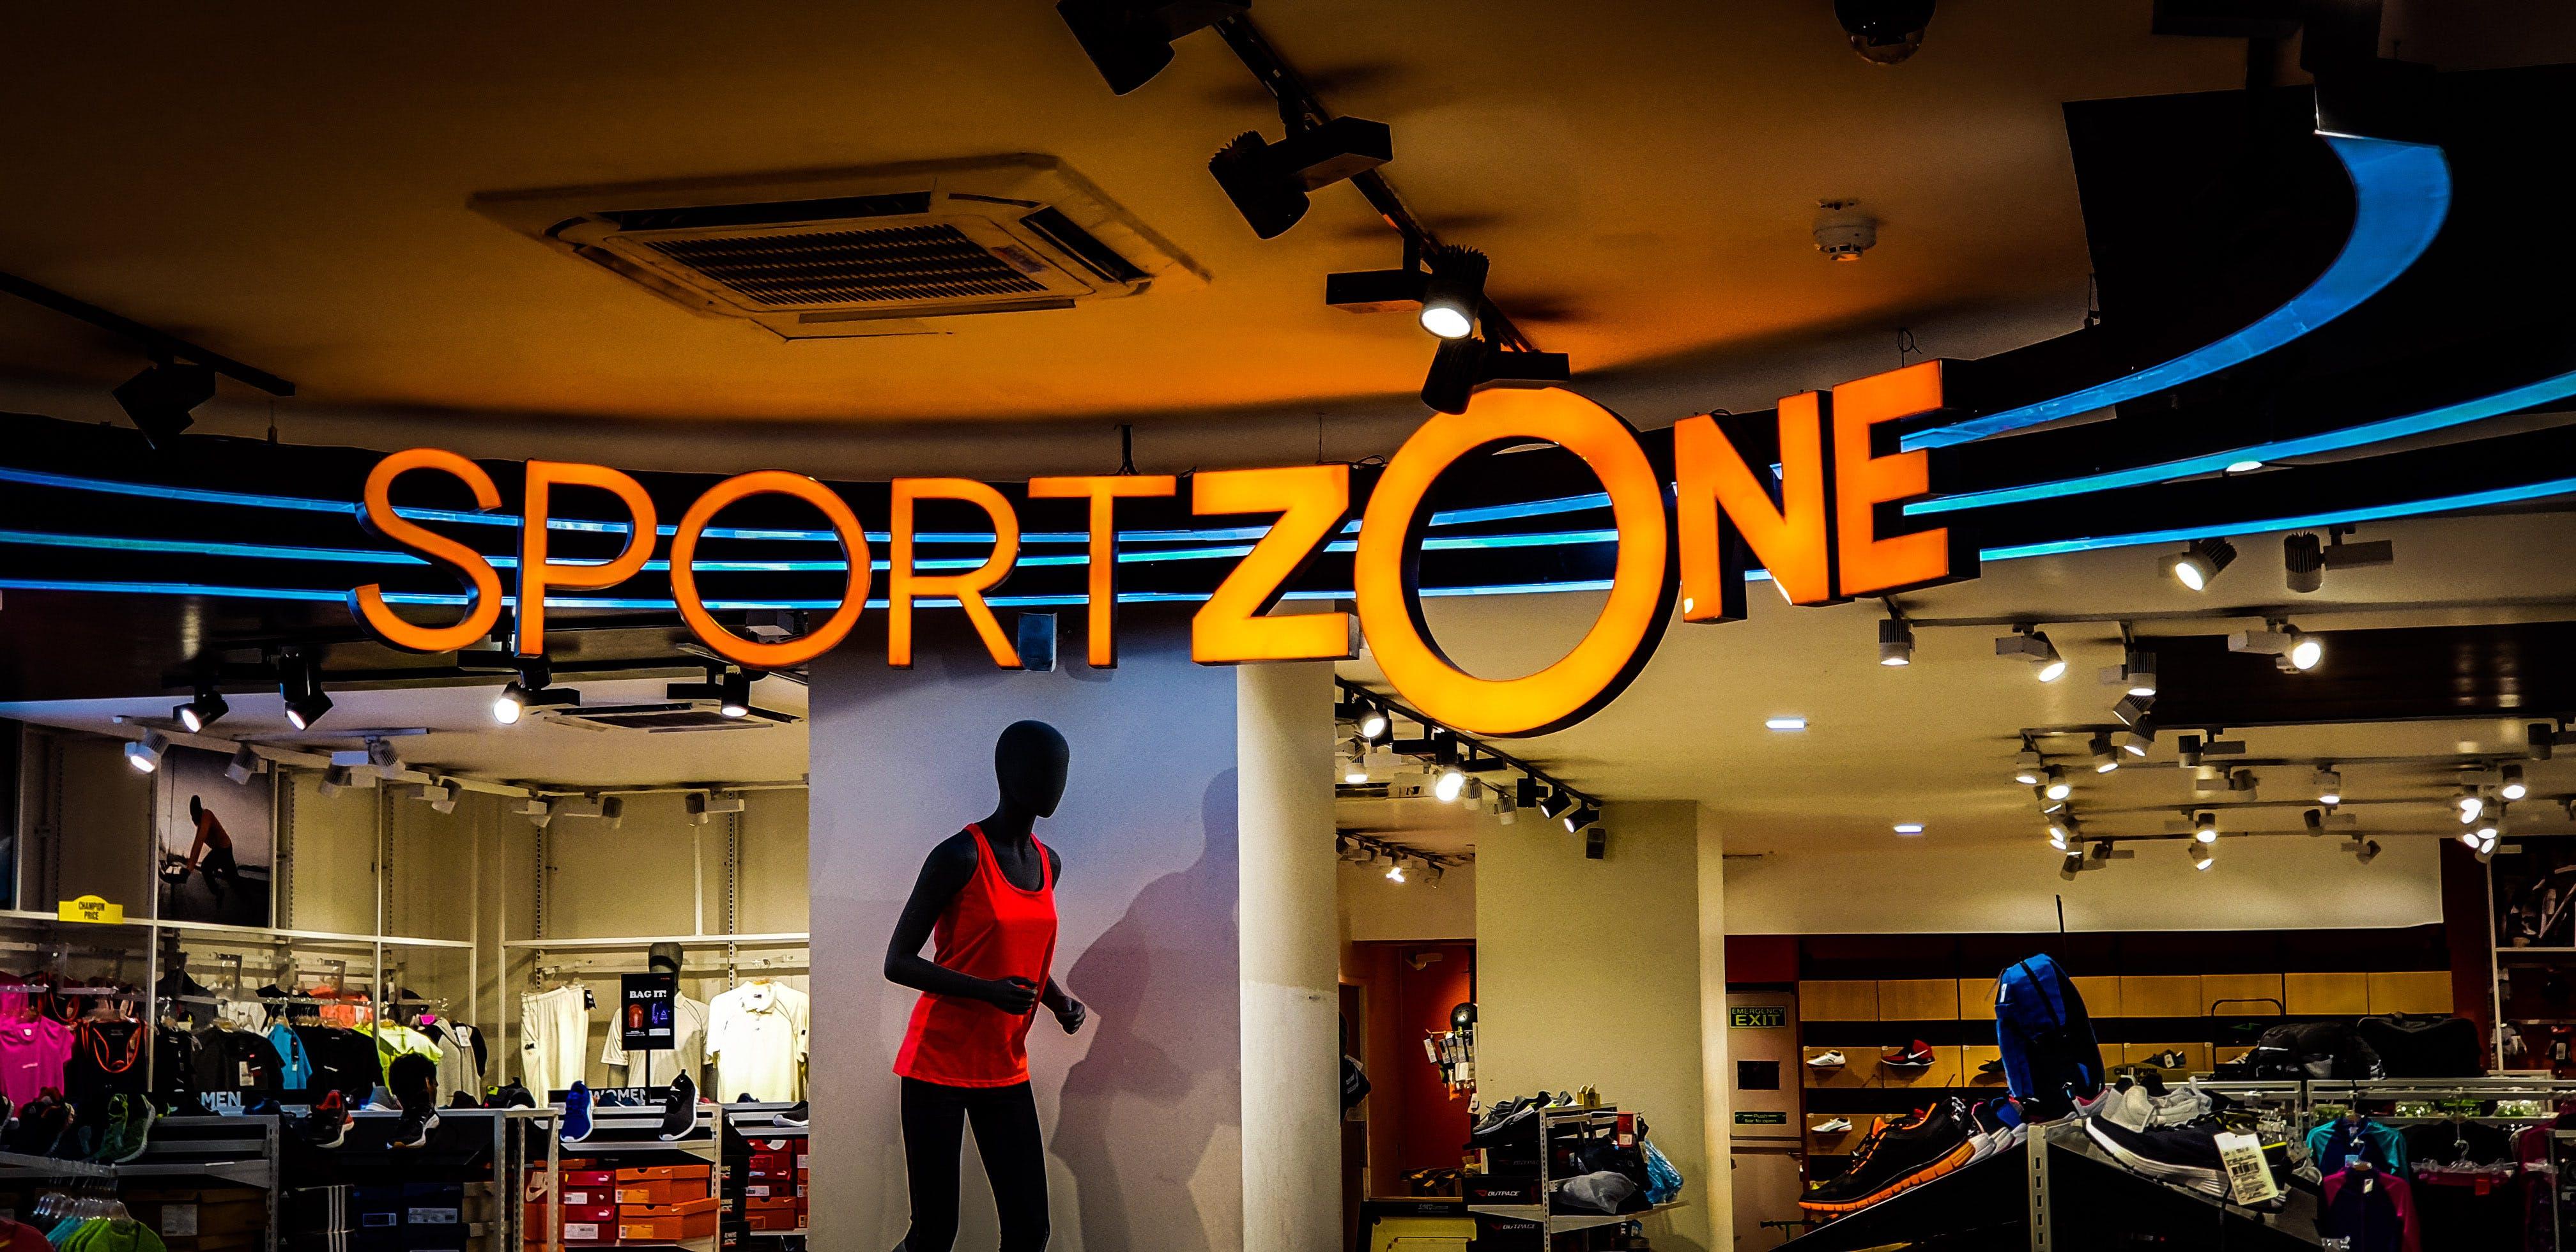 Sport Zone Signage